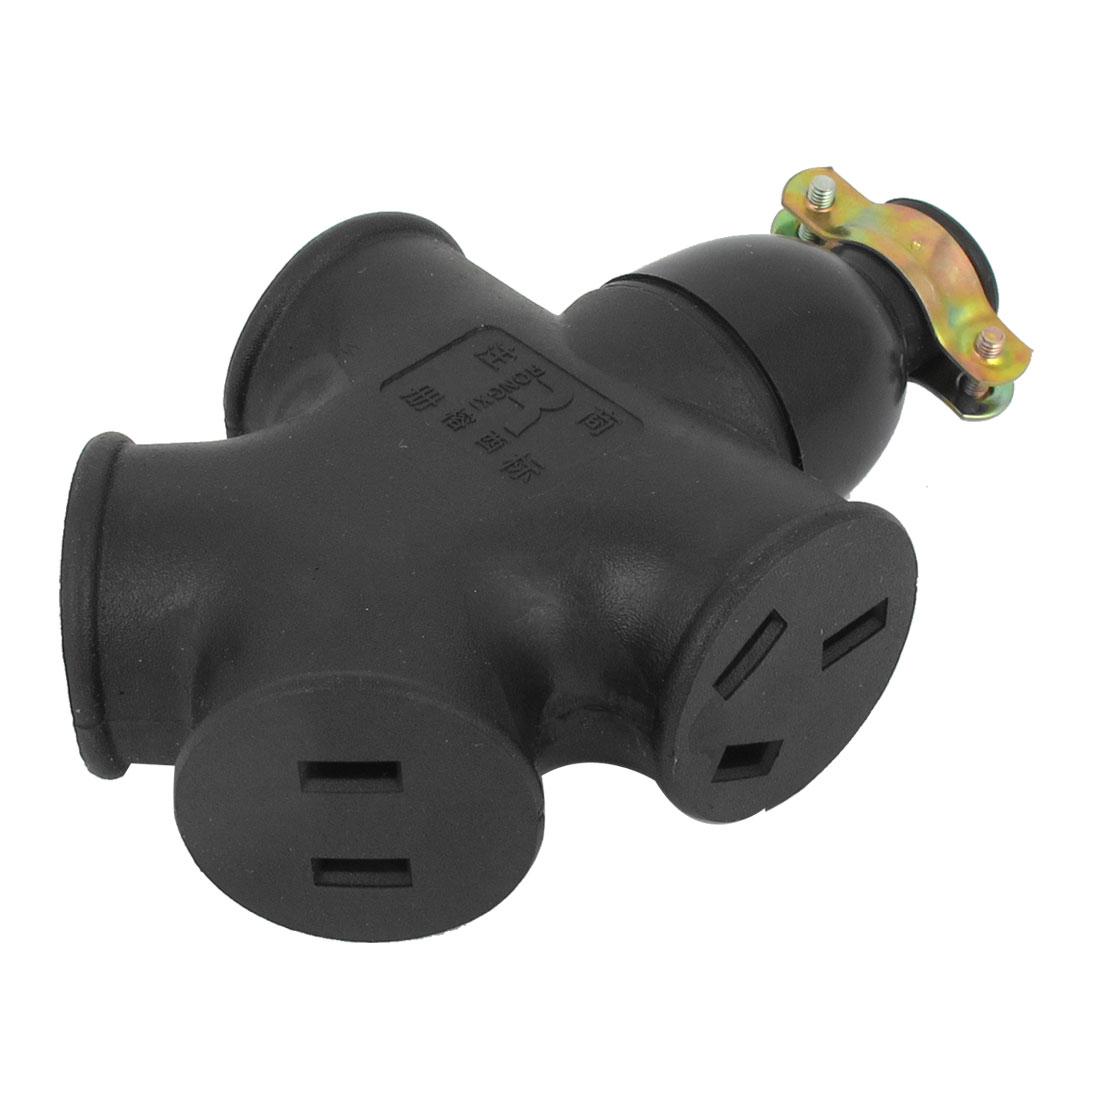 AC 125V 250V 15A AU US Four Power Outlet Waterproof Industrial Connector Socket